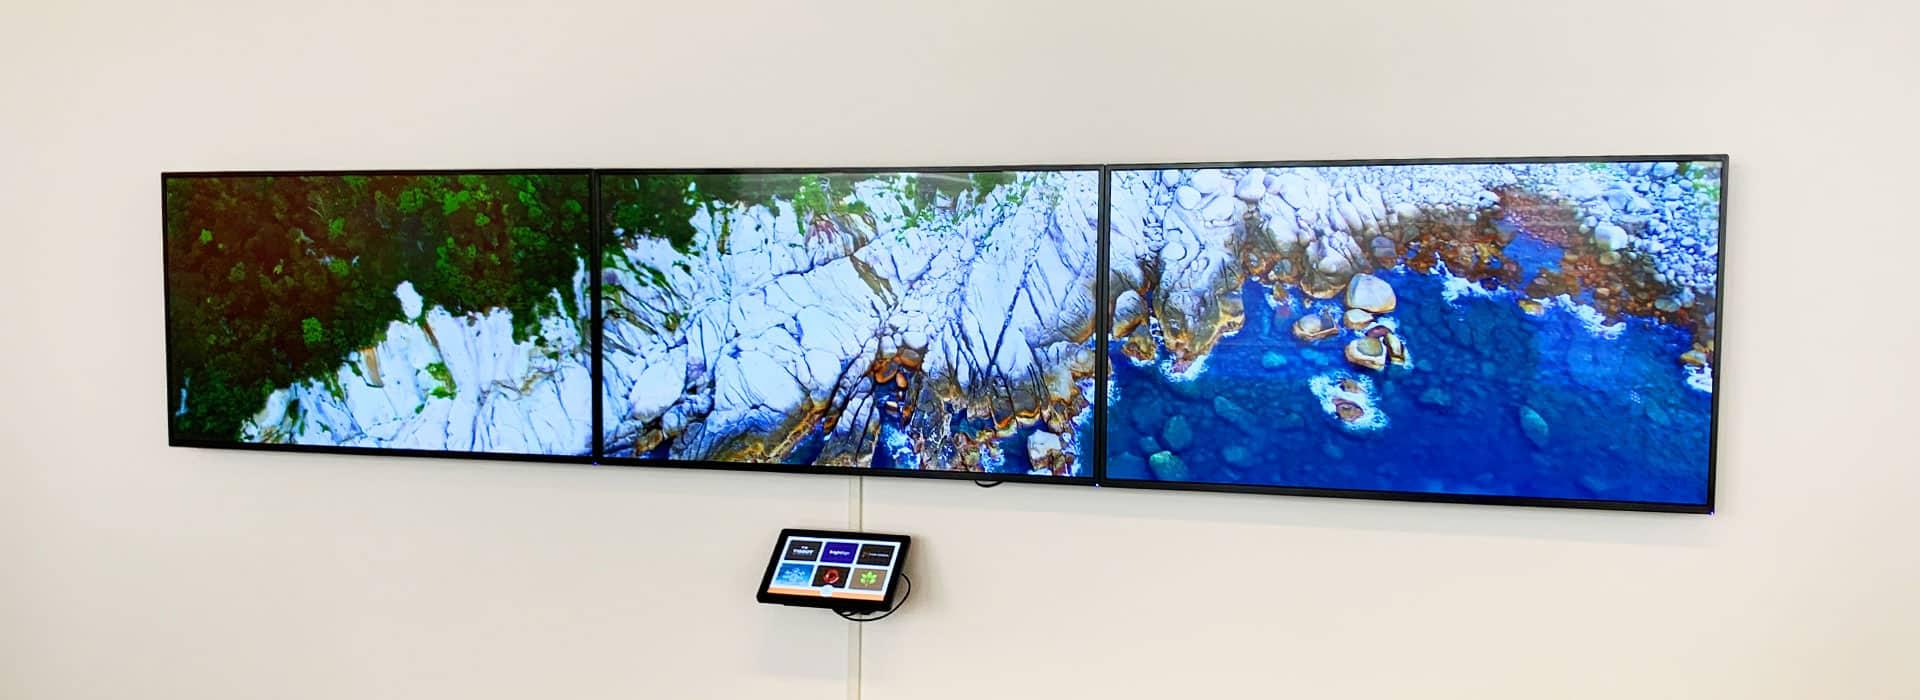 Bluefin Display als BrightSign Controlpanel